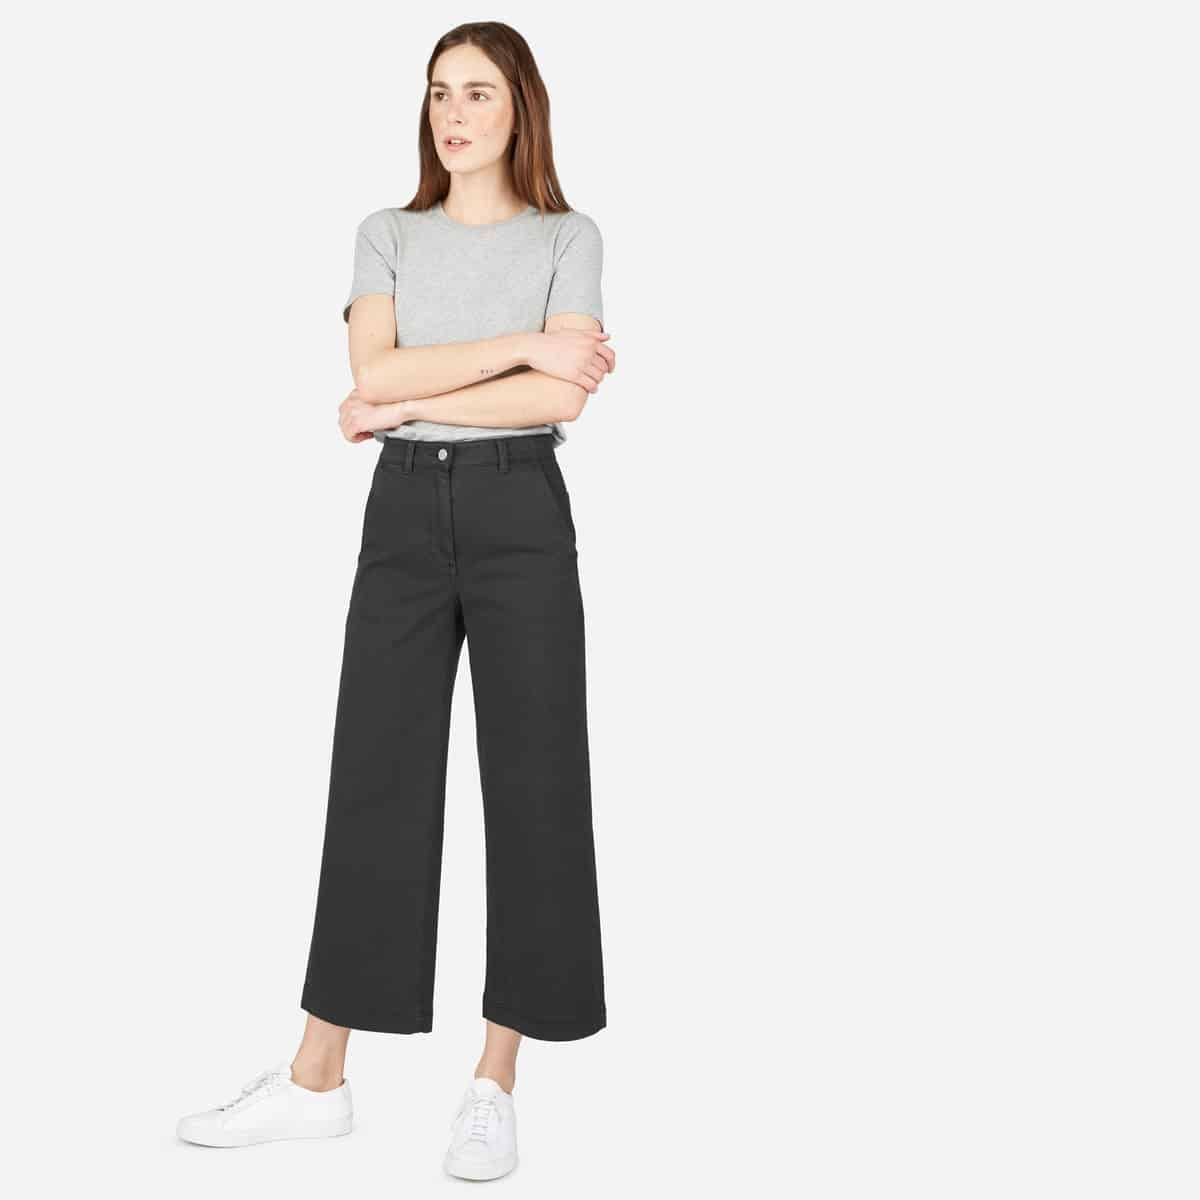 Grey, wide leg crop pants